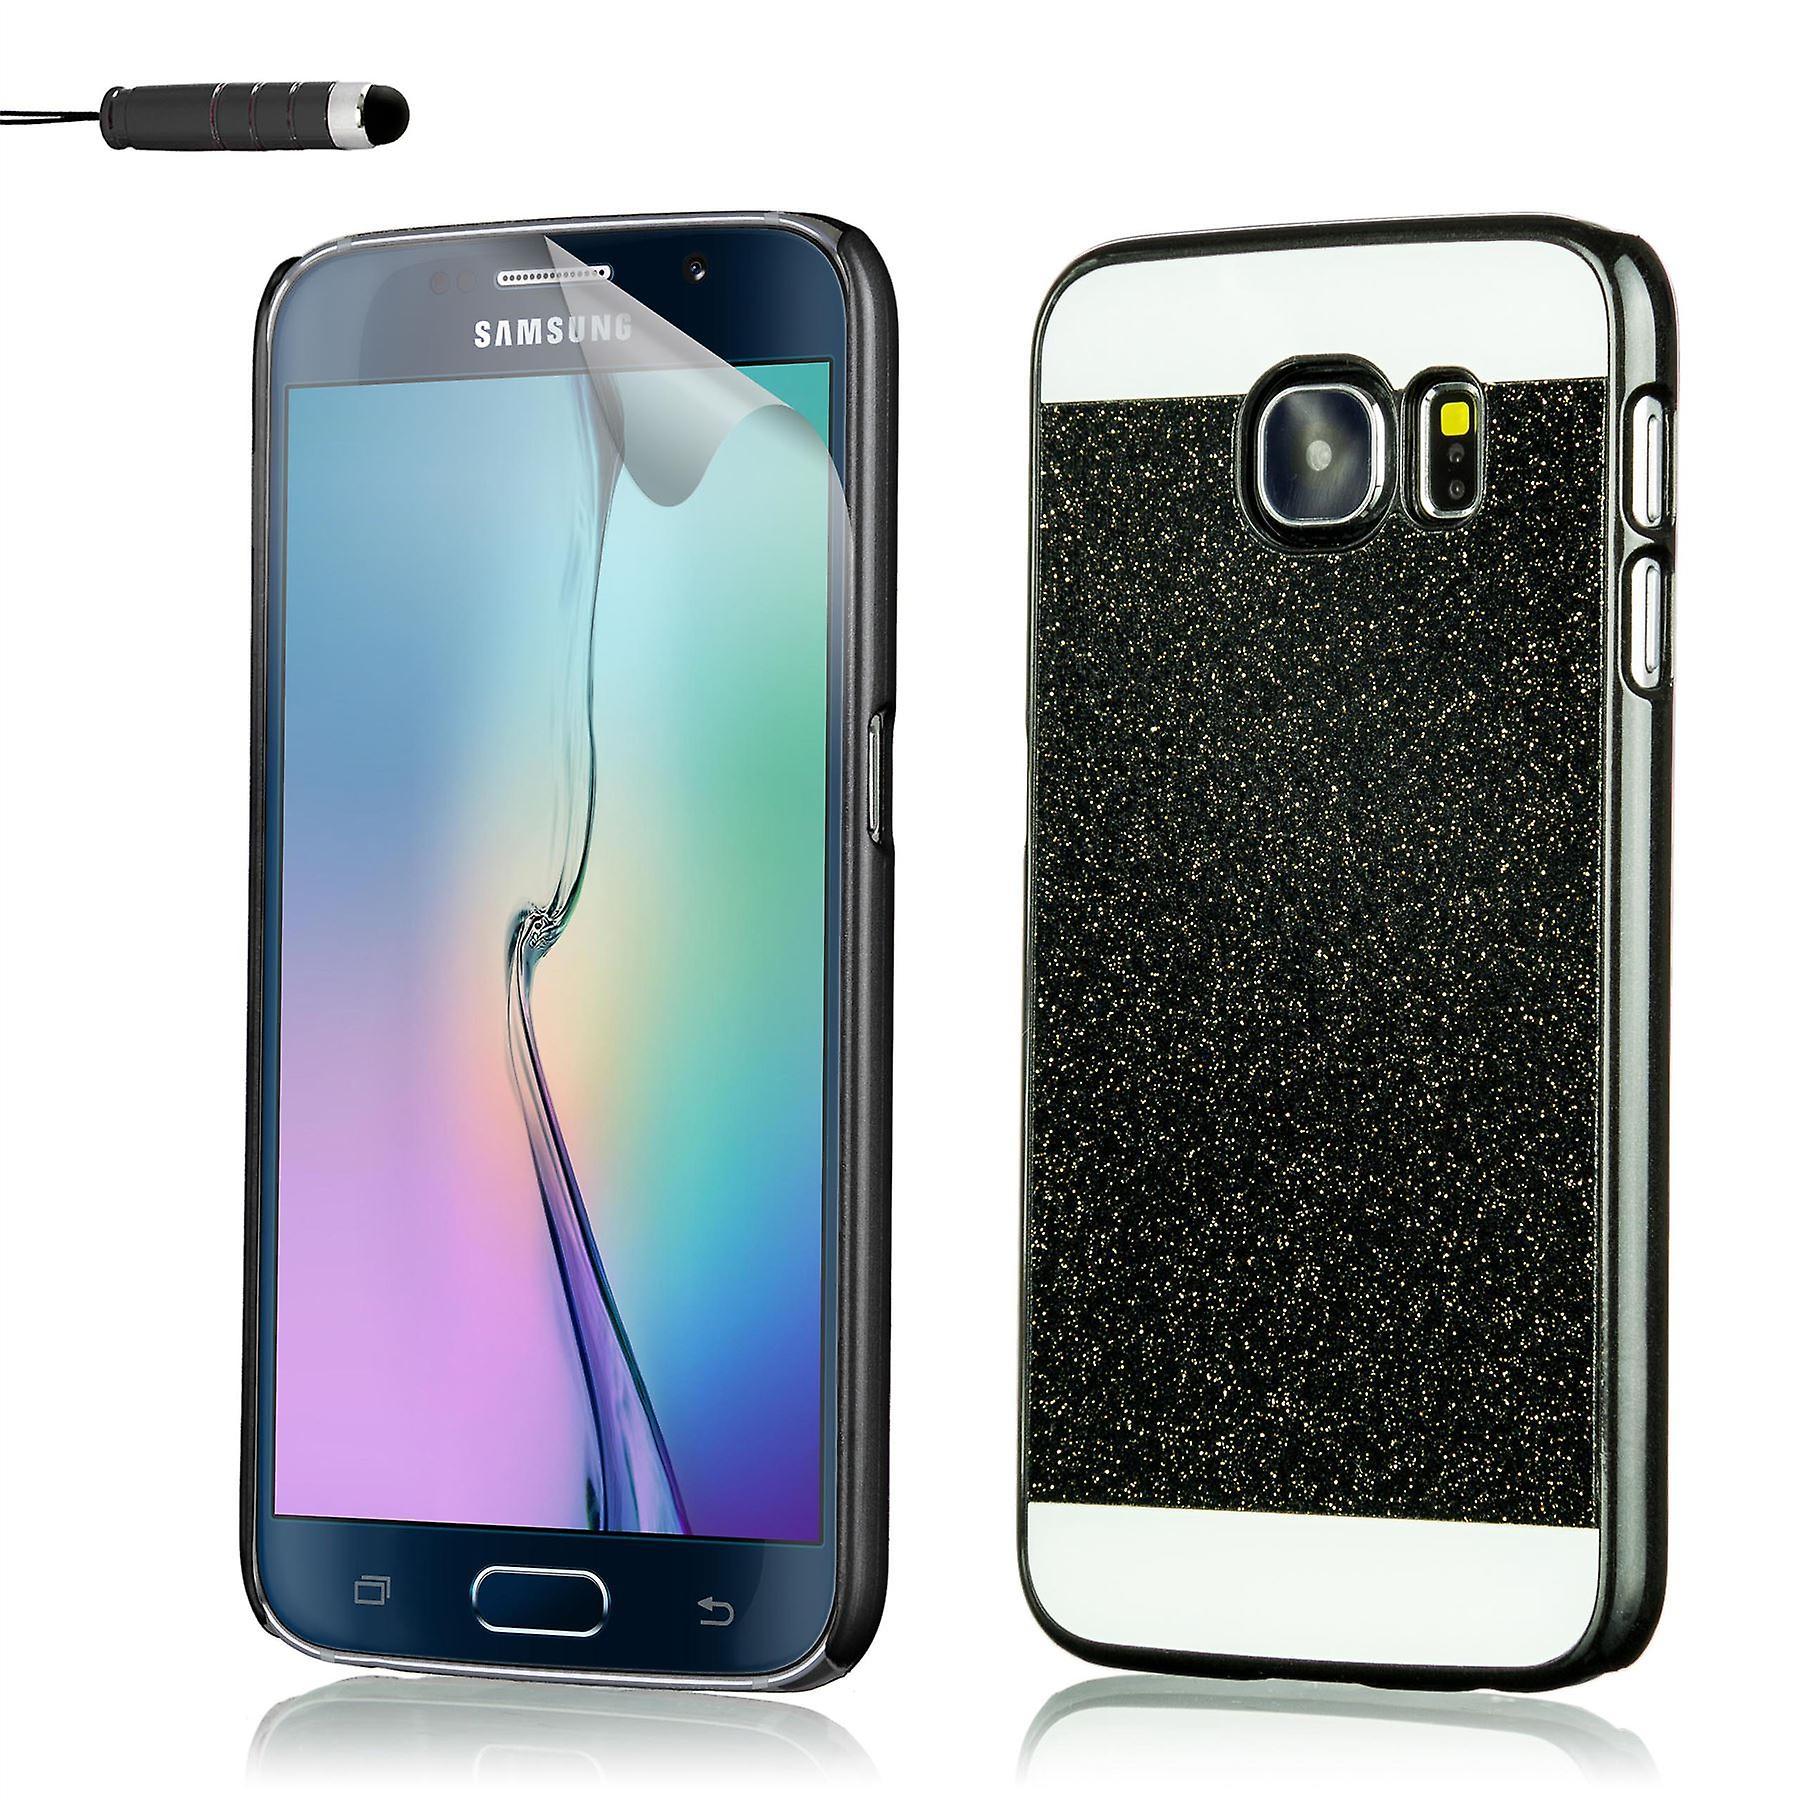 Glitter case for Samsung Galaxy S6 Edge SM-G925 - Black